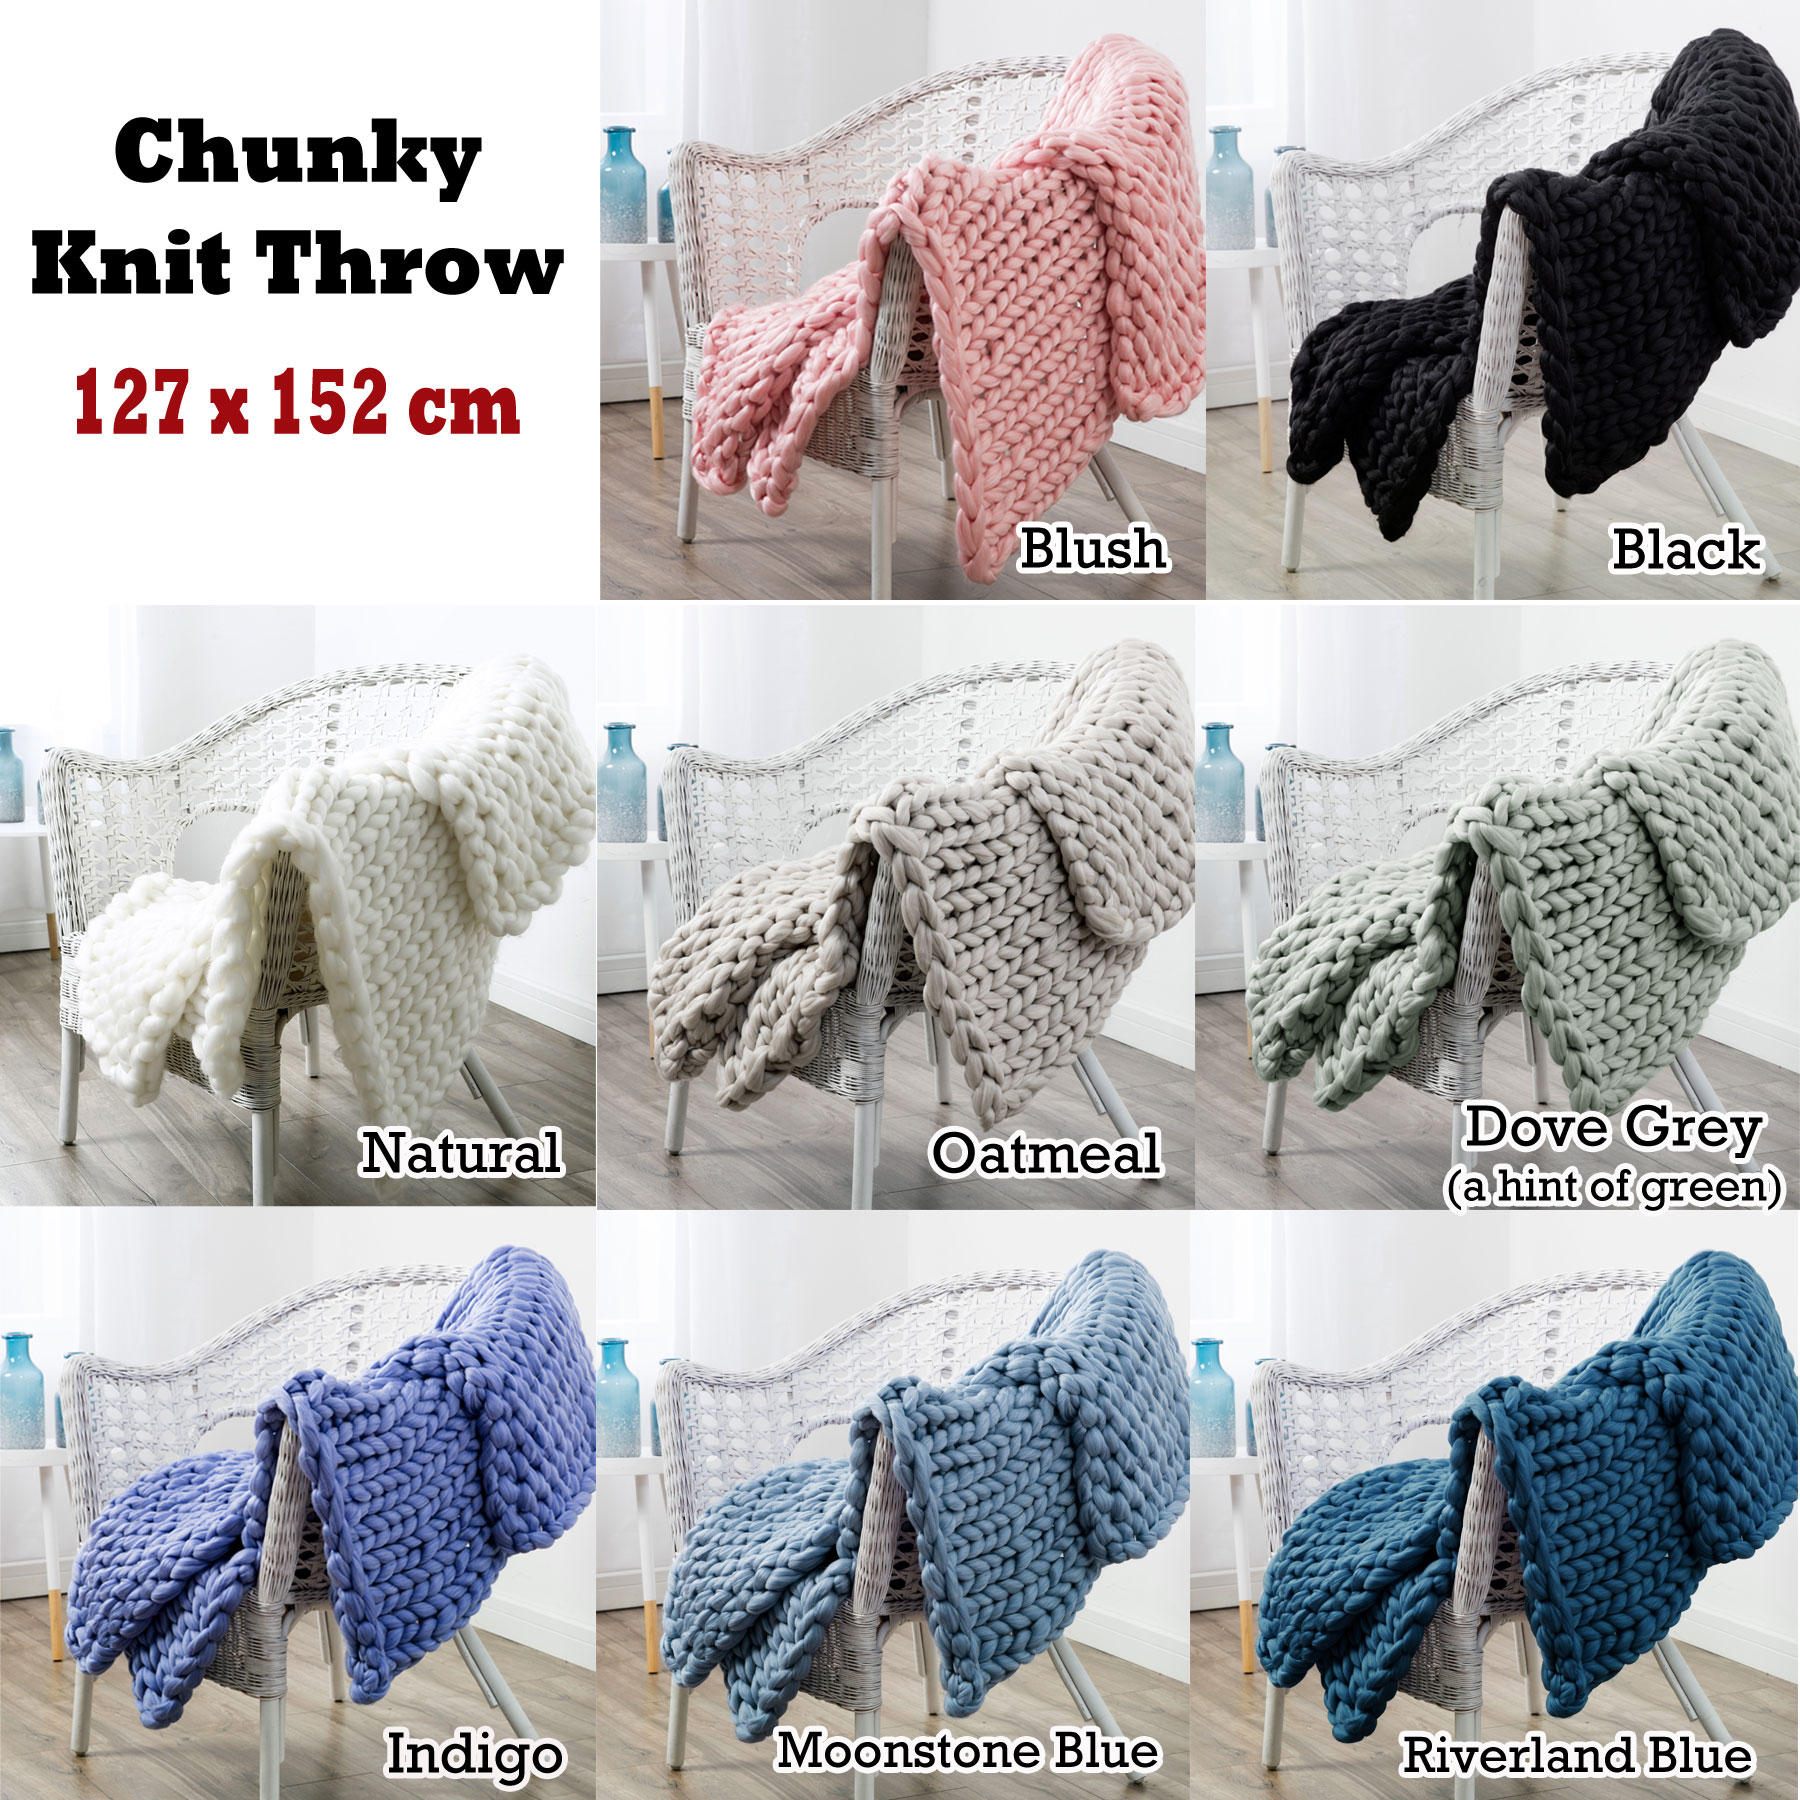 Acrylic Chunky Knit Sofa Lounge Bed Throw Rug Blanket Runner Ebay